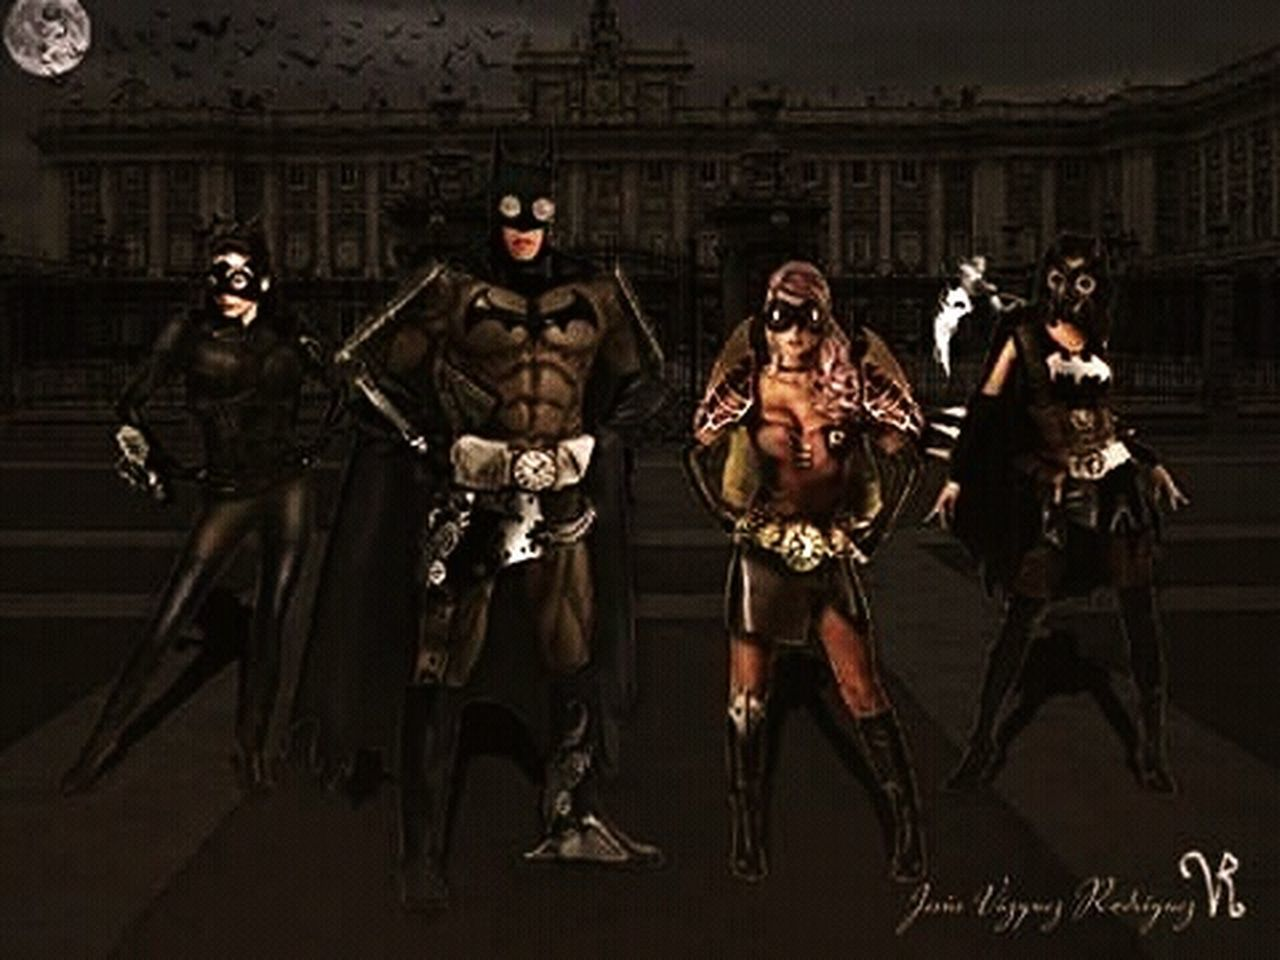 Batman Batman ❤ Catwoman Robin Batgirl Steampunk Art, Drawing, Creativity ArtWork Art Artist Artistic Ilustracion Illustration Illustrator Illustrations  Ilustration Ilustrator Ilustraciones